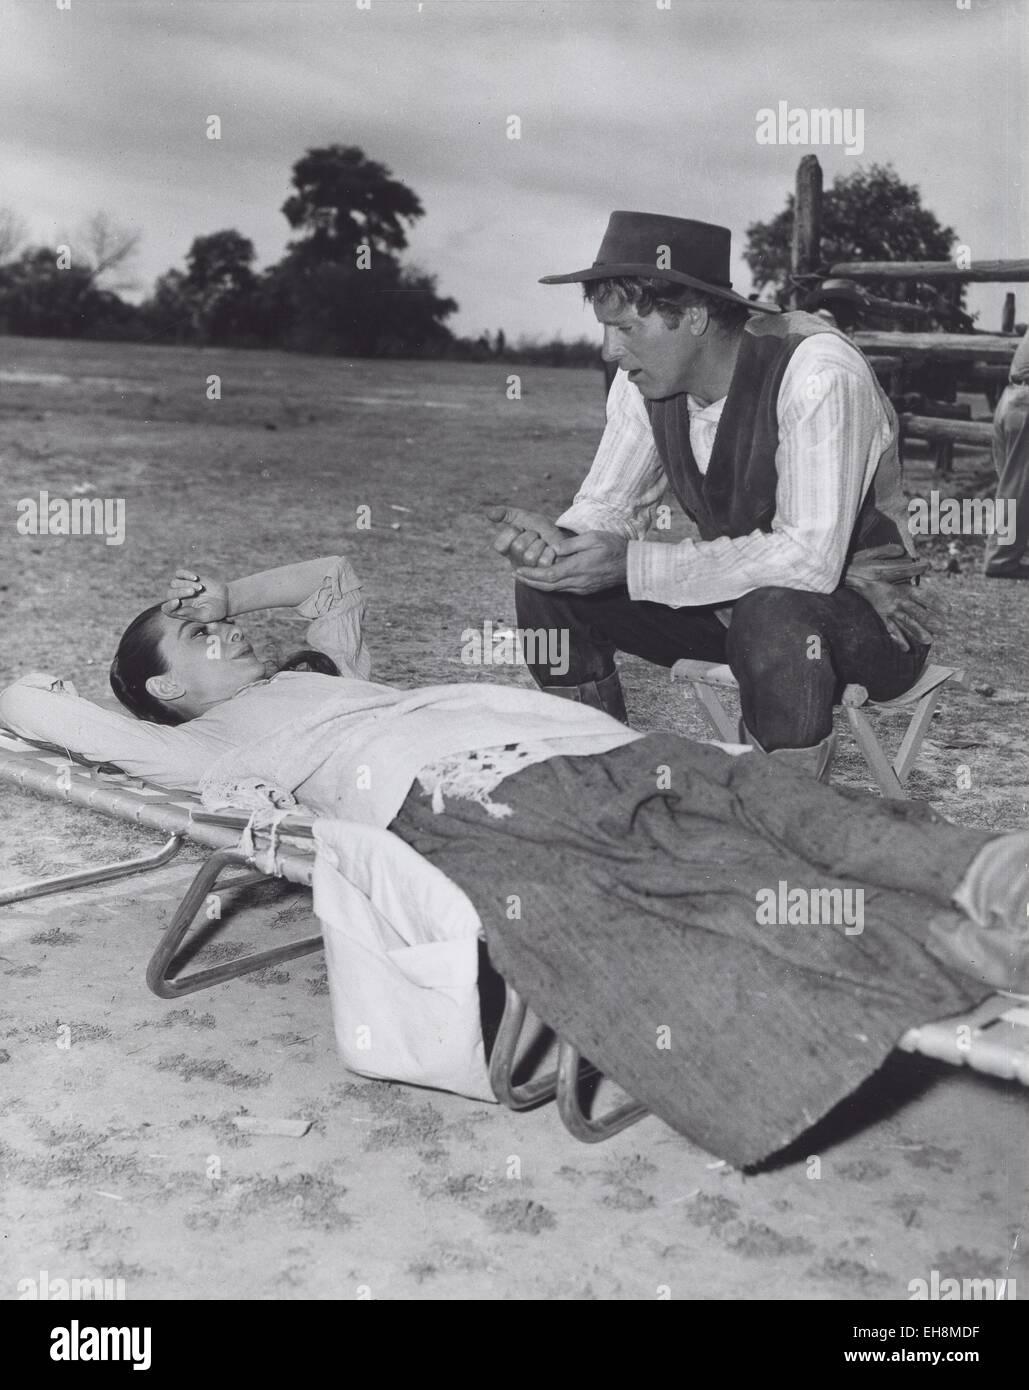 AUDREY HEPBURN Burt Lancaster.The Unforgiven 1960. © Smp/Globe Photos/ZUMA Wire/Alamy Live News - Stock Image